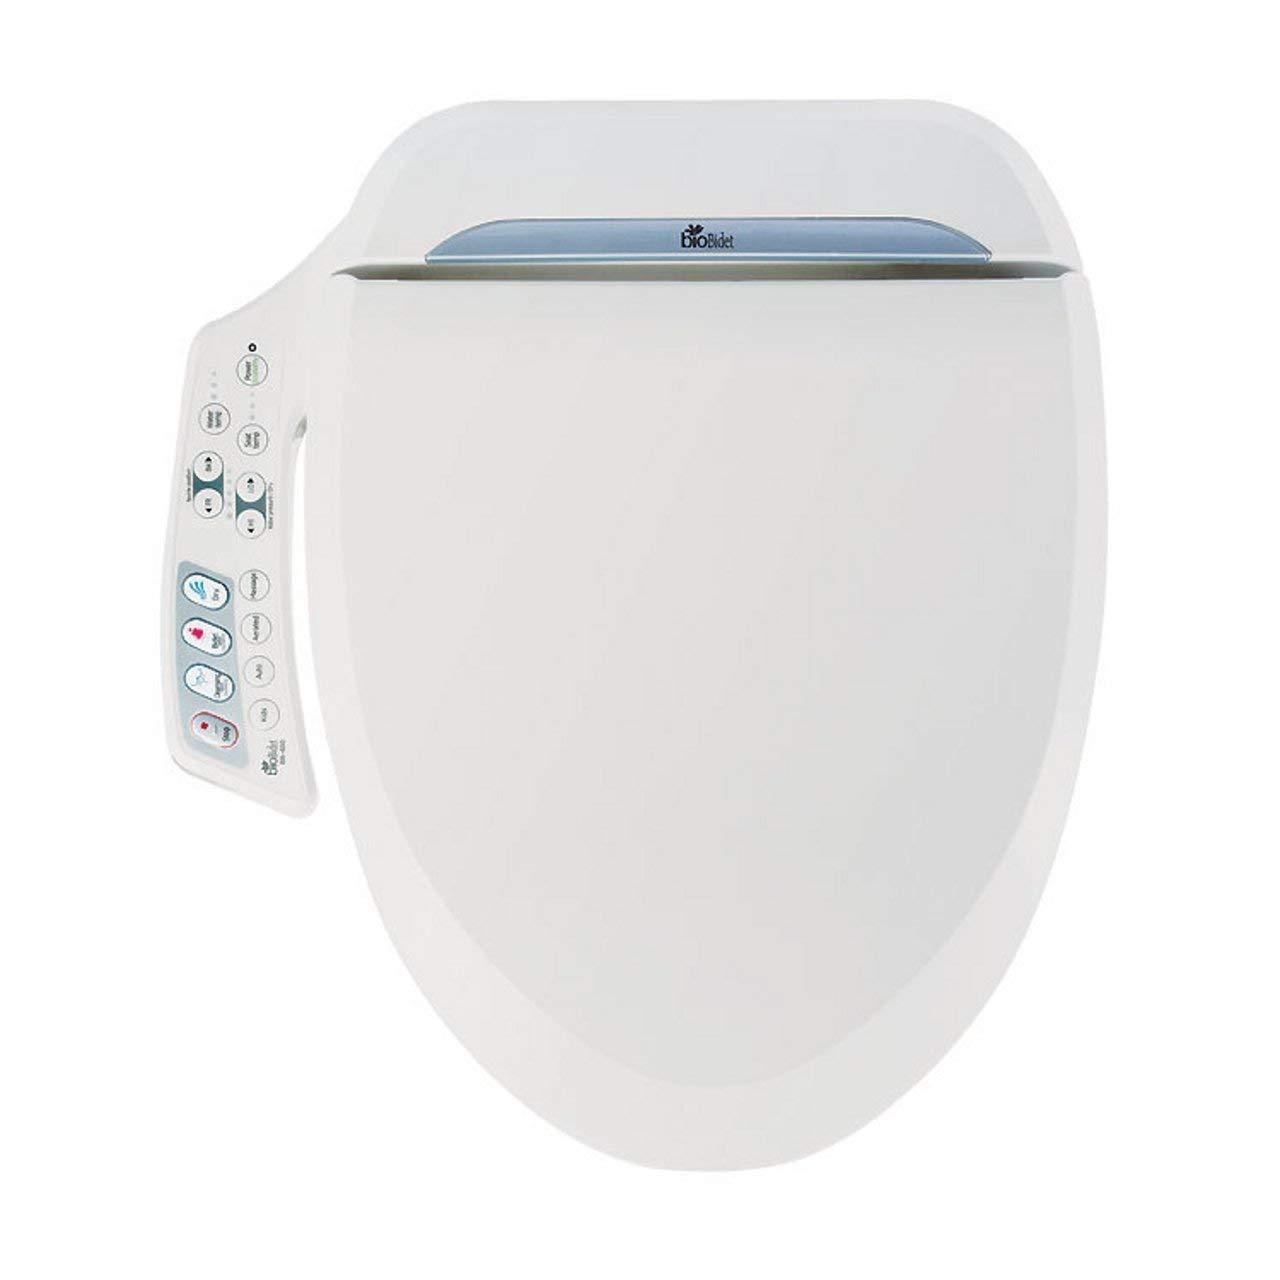 Prime Members: Bio Bidet Ultimate BB-600 Advanced Bidet Toilet Seat (Round) $199.82 + Free Shipping